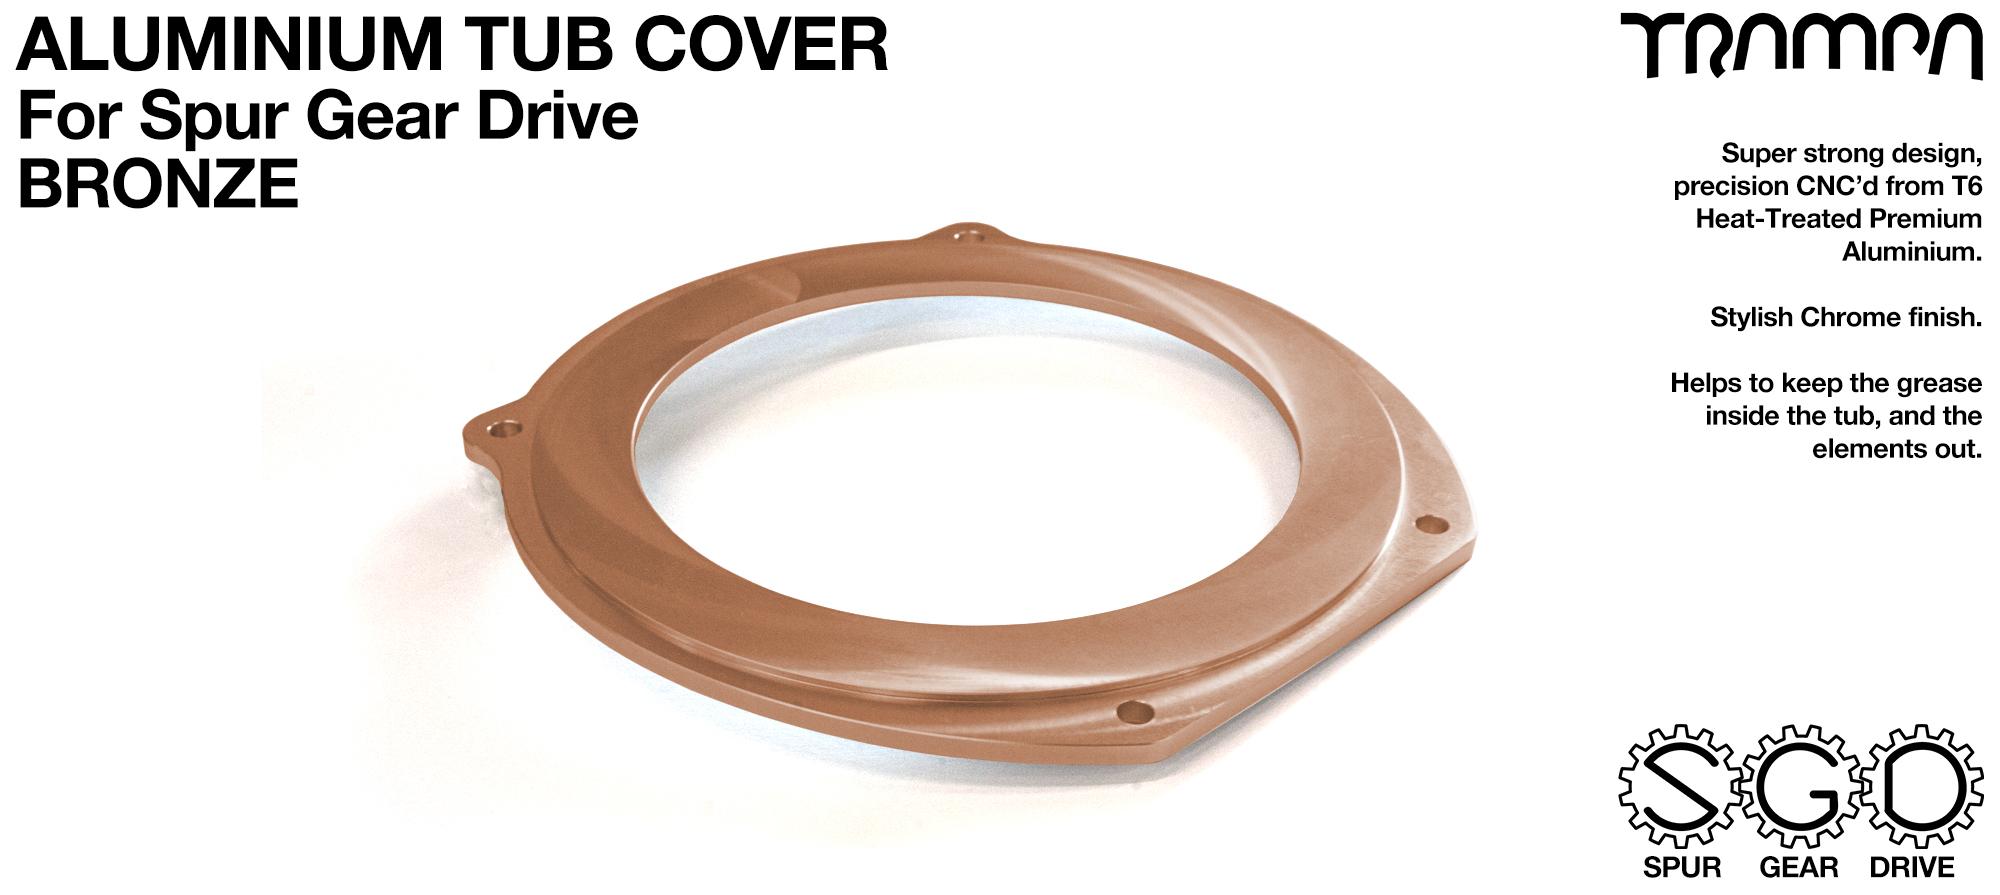 TRAMPA MKII Spur Gear Drive T6 Aluminium Tub Cover - BRONZE